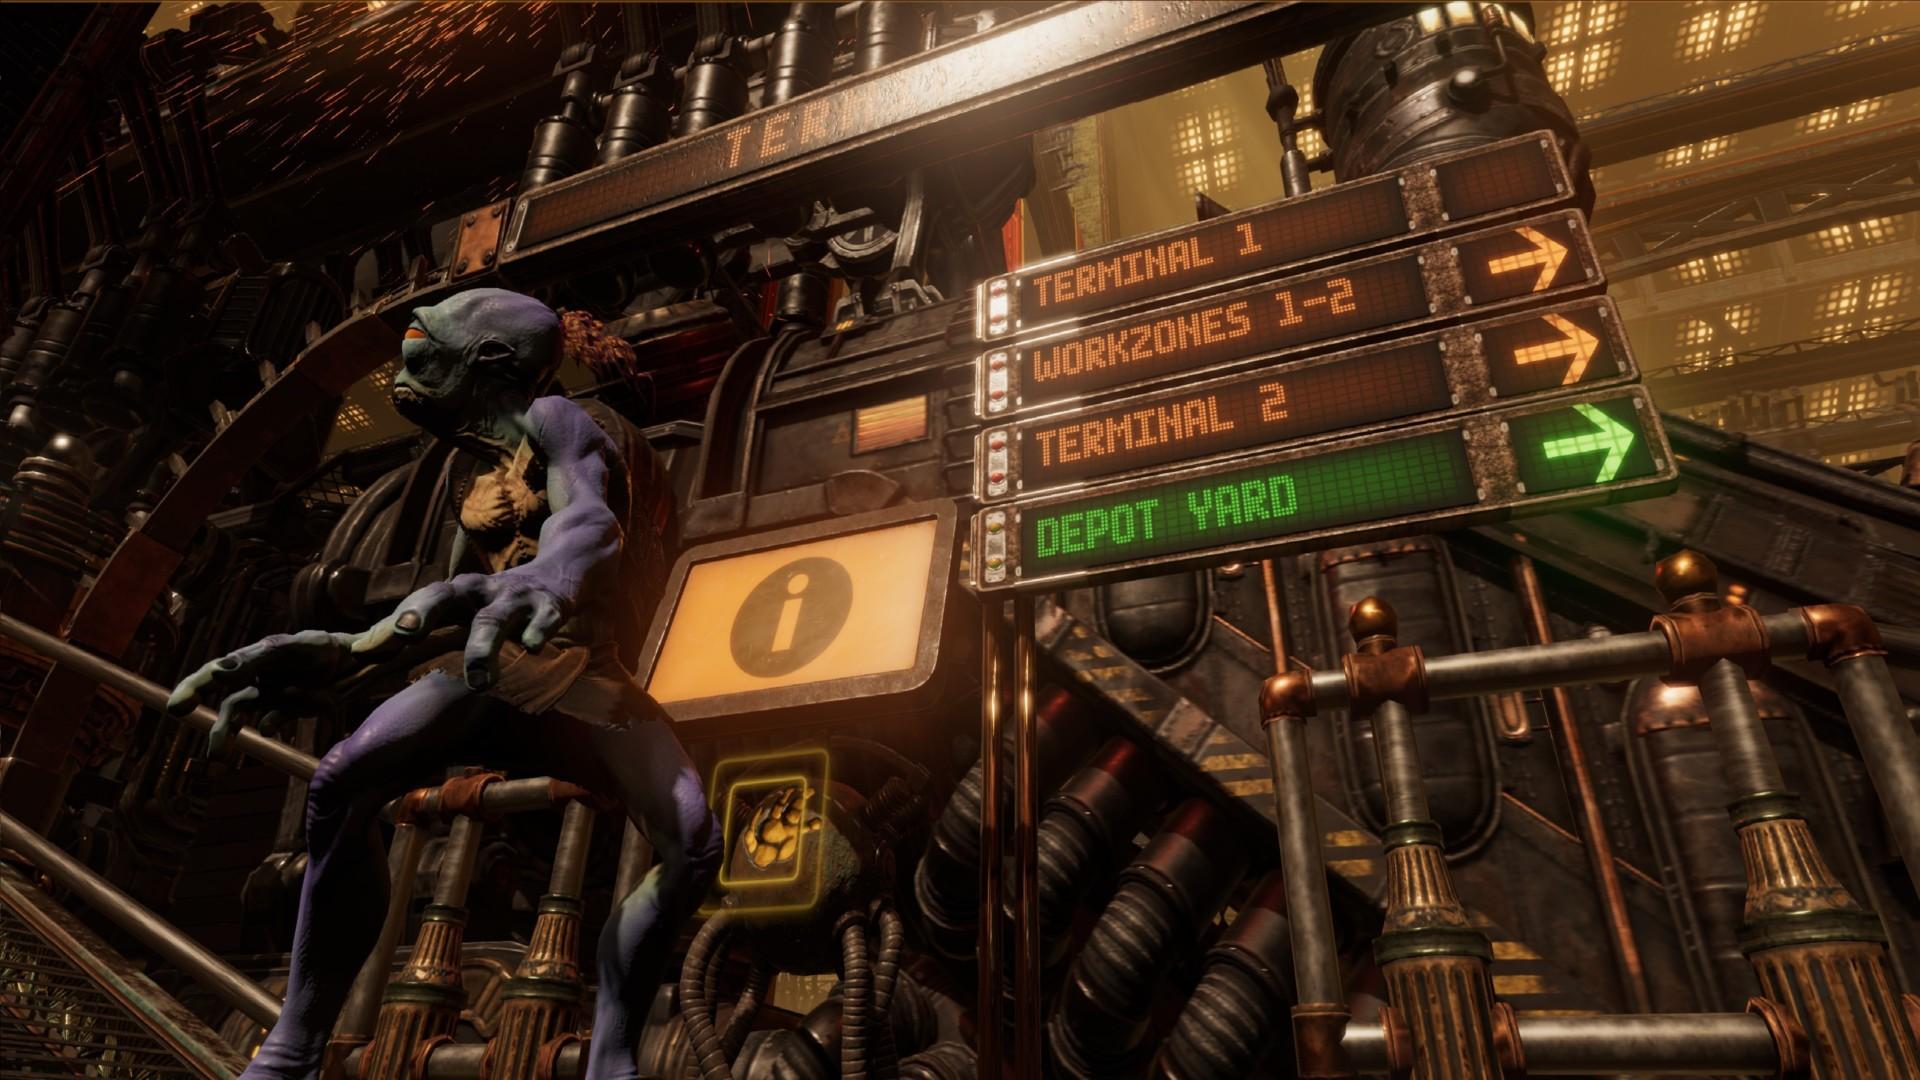 Oddworld Soulstorm Mudokon Locations Guide Endings Feeco Depot The Yards